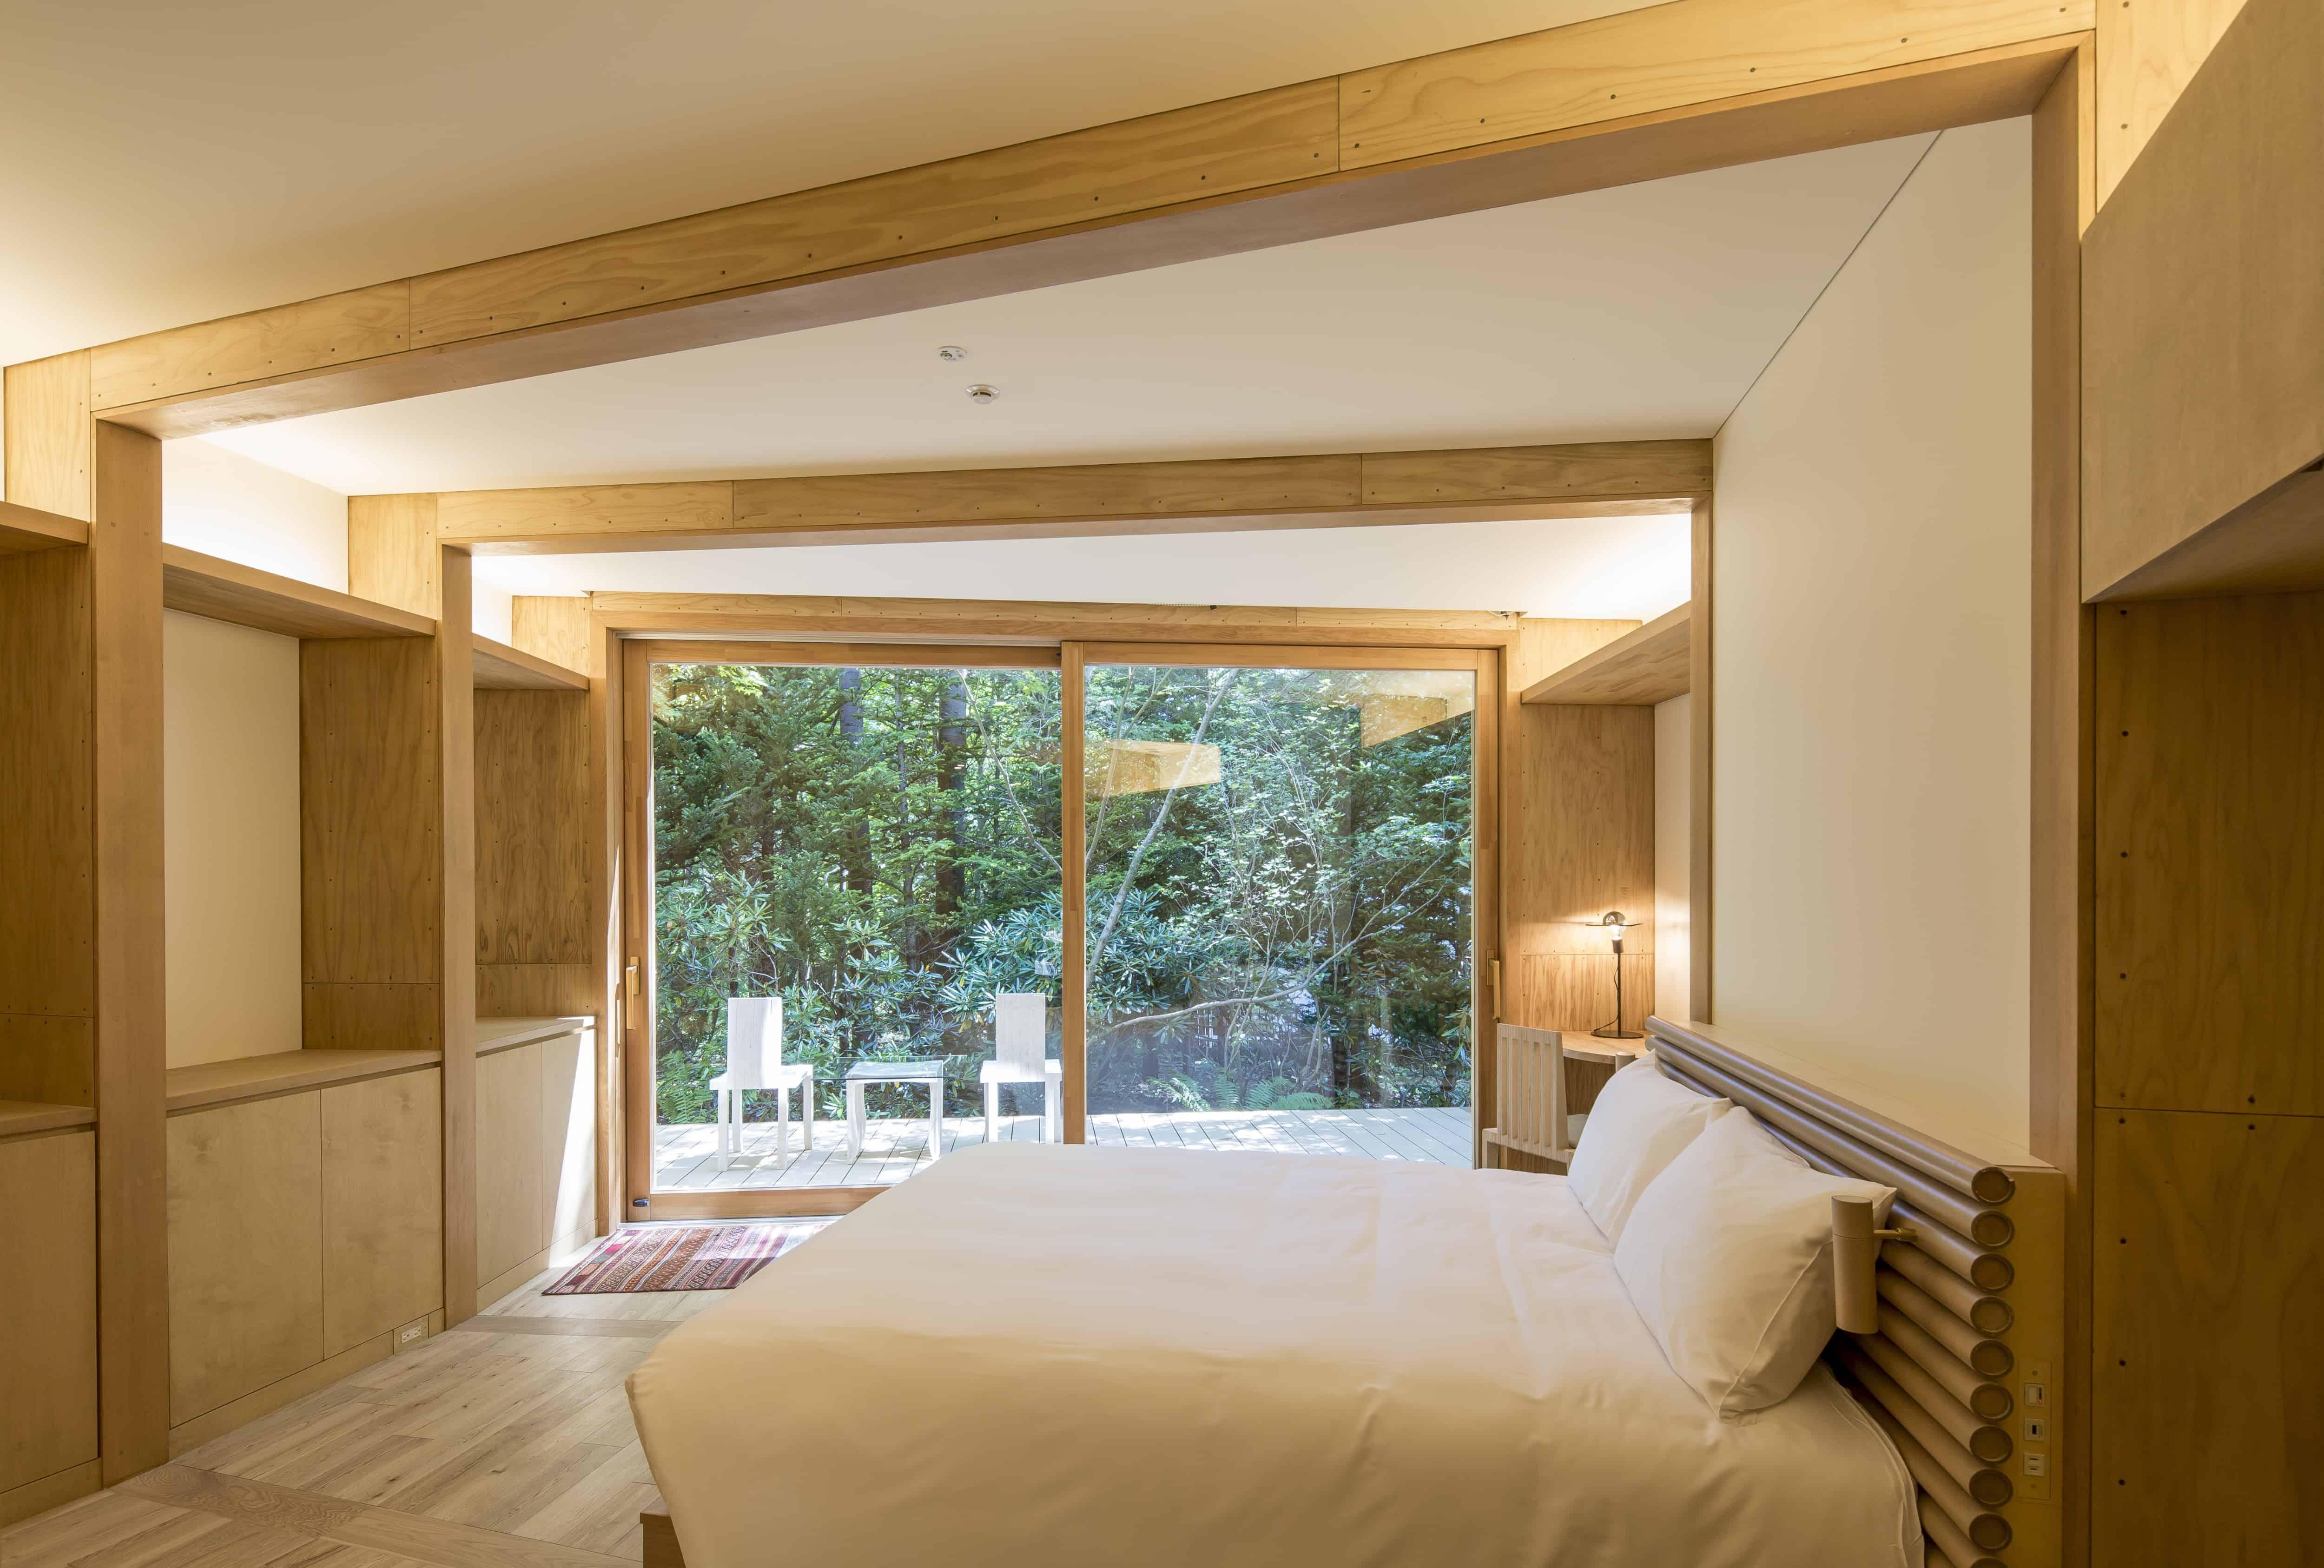 SHISHI-IWA HOUSE ที่พักในคารุอิซาวะ